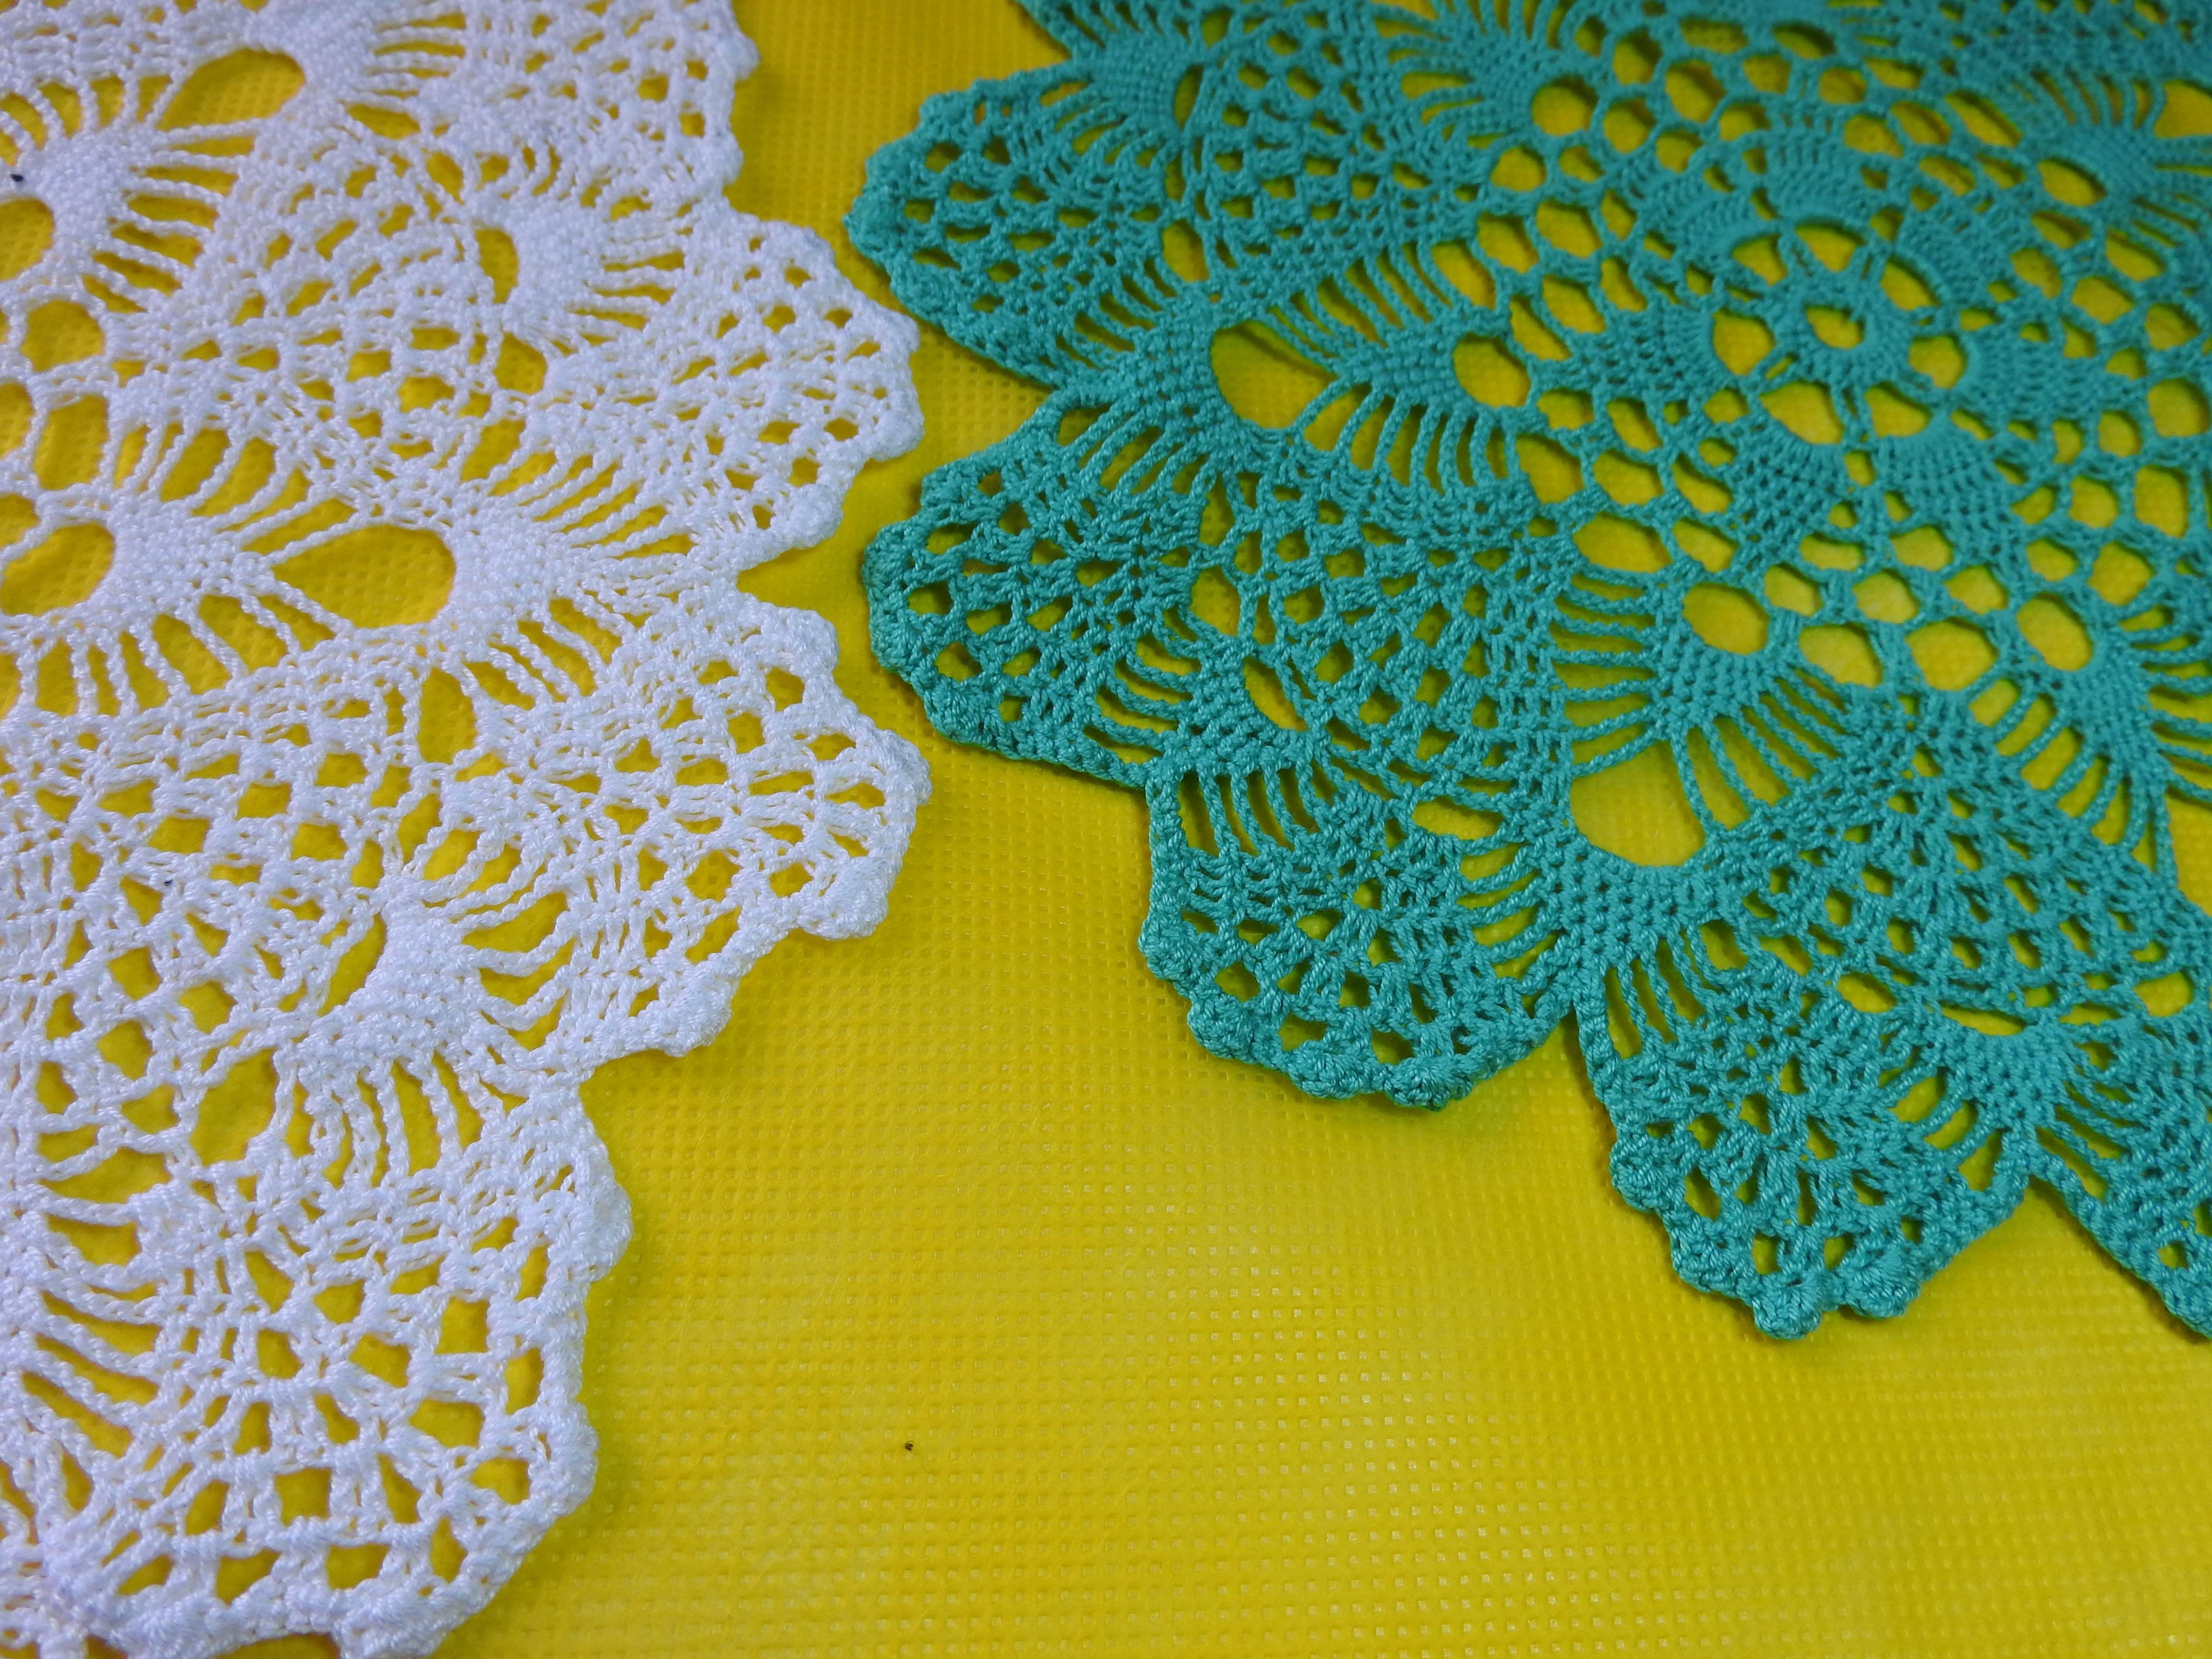 Fotos gratis : flor, patrón, decoración, material, servilleta ...